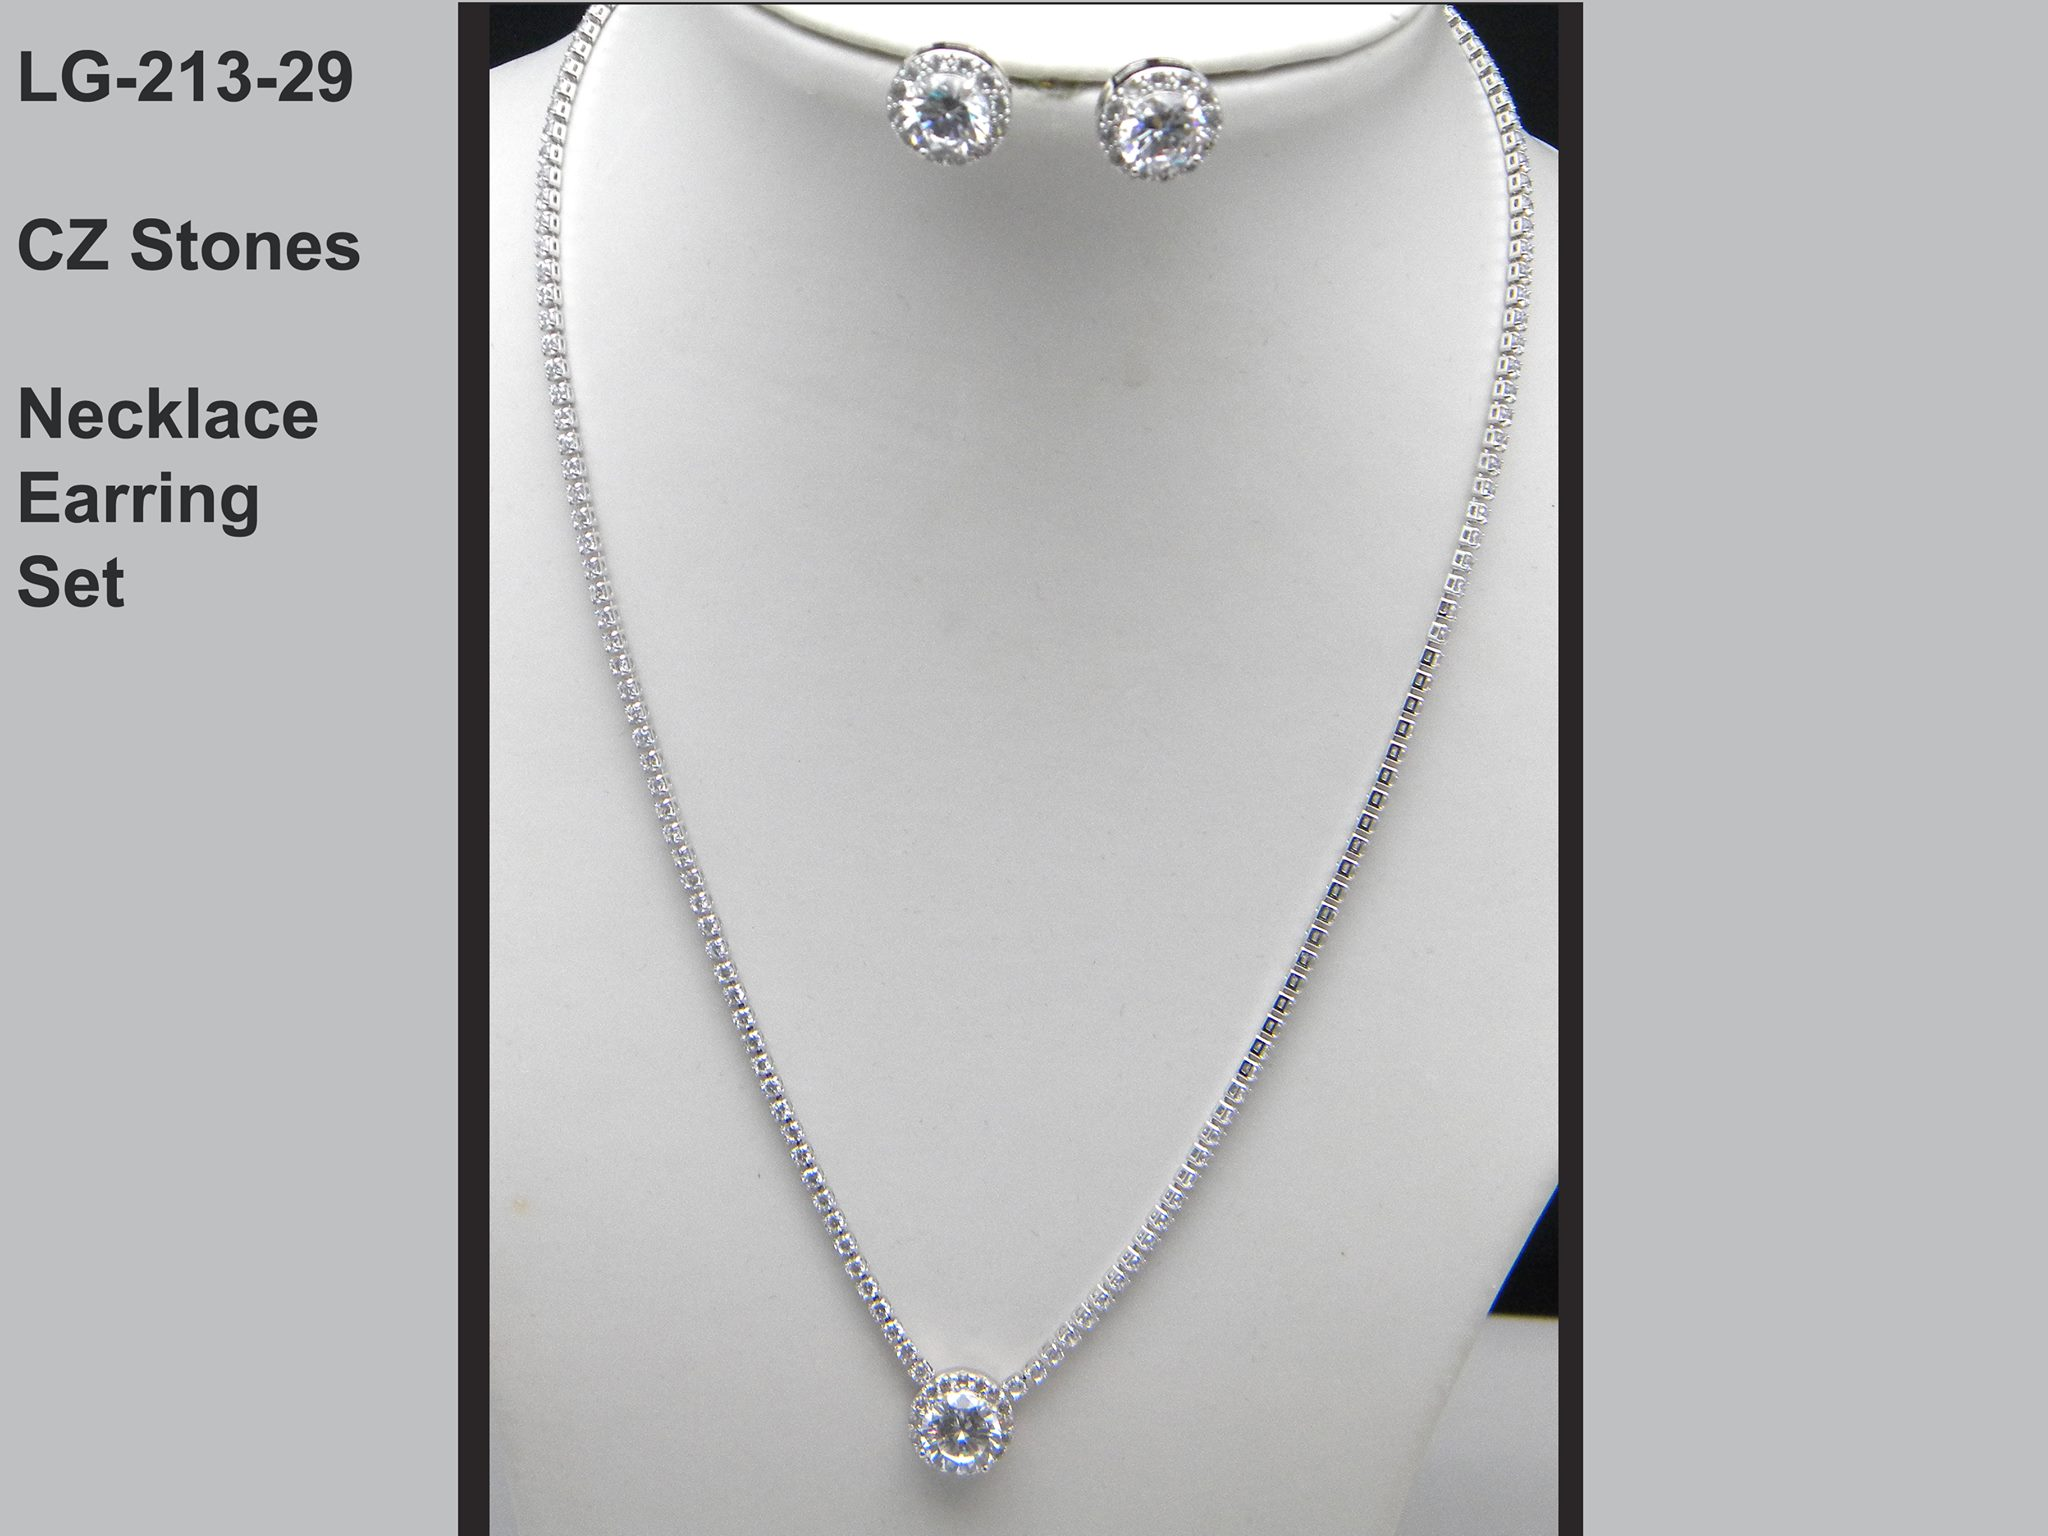 Jewelry Style No. LG 213